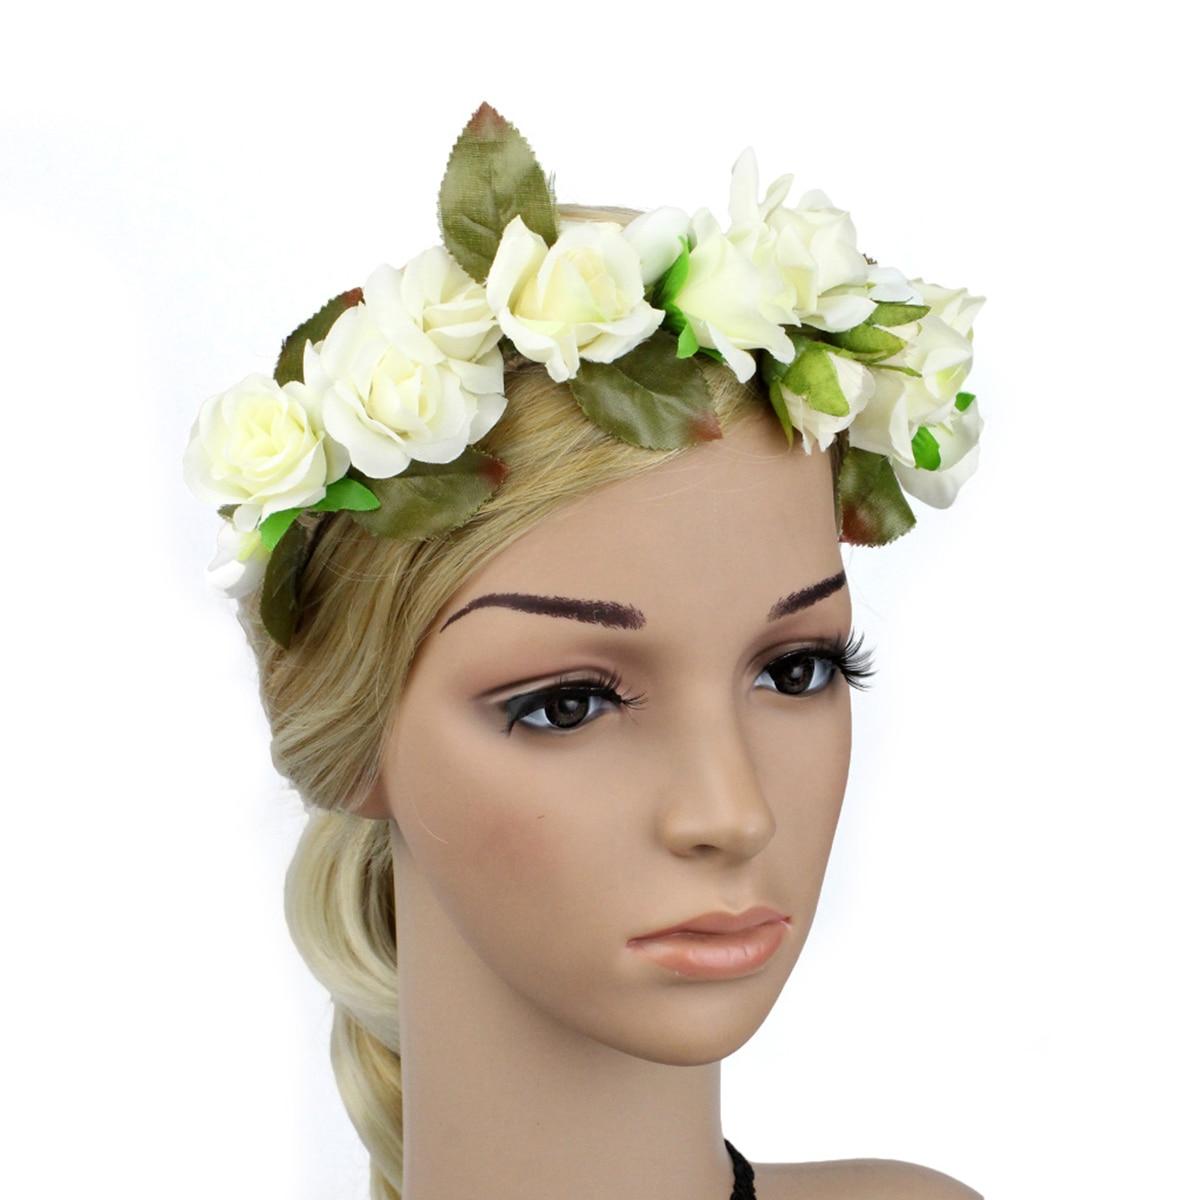 Boho flower crown headband floral headpiece for wedding bridal fairy boho flower crown headband floral headpiece for wedding bridal fairy halo circlet hair accessories head wreath garland in hair accessories from womens izmirmasajfo